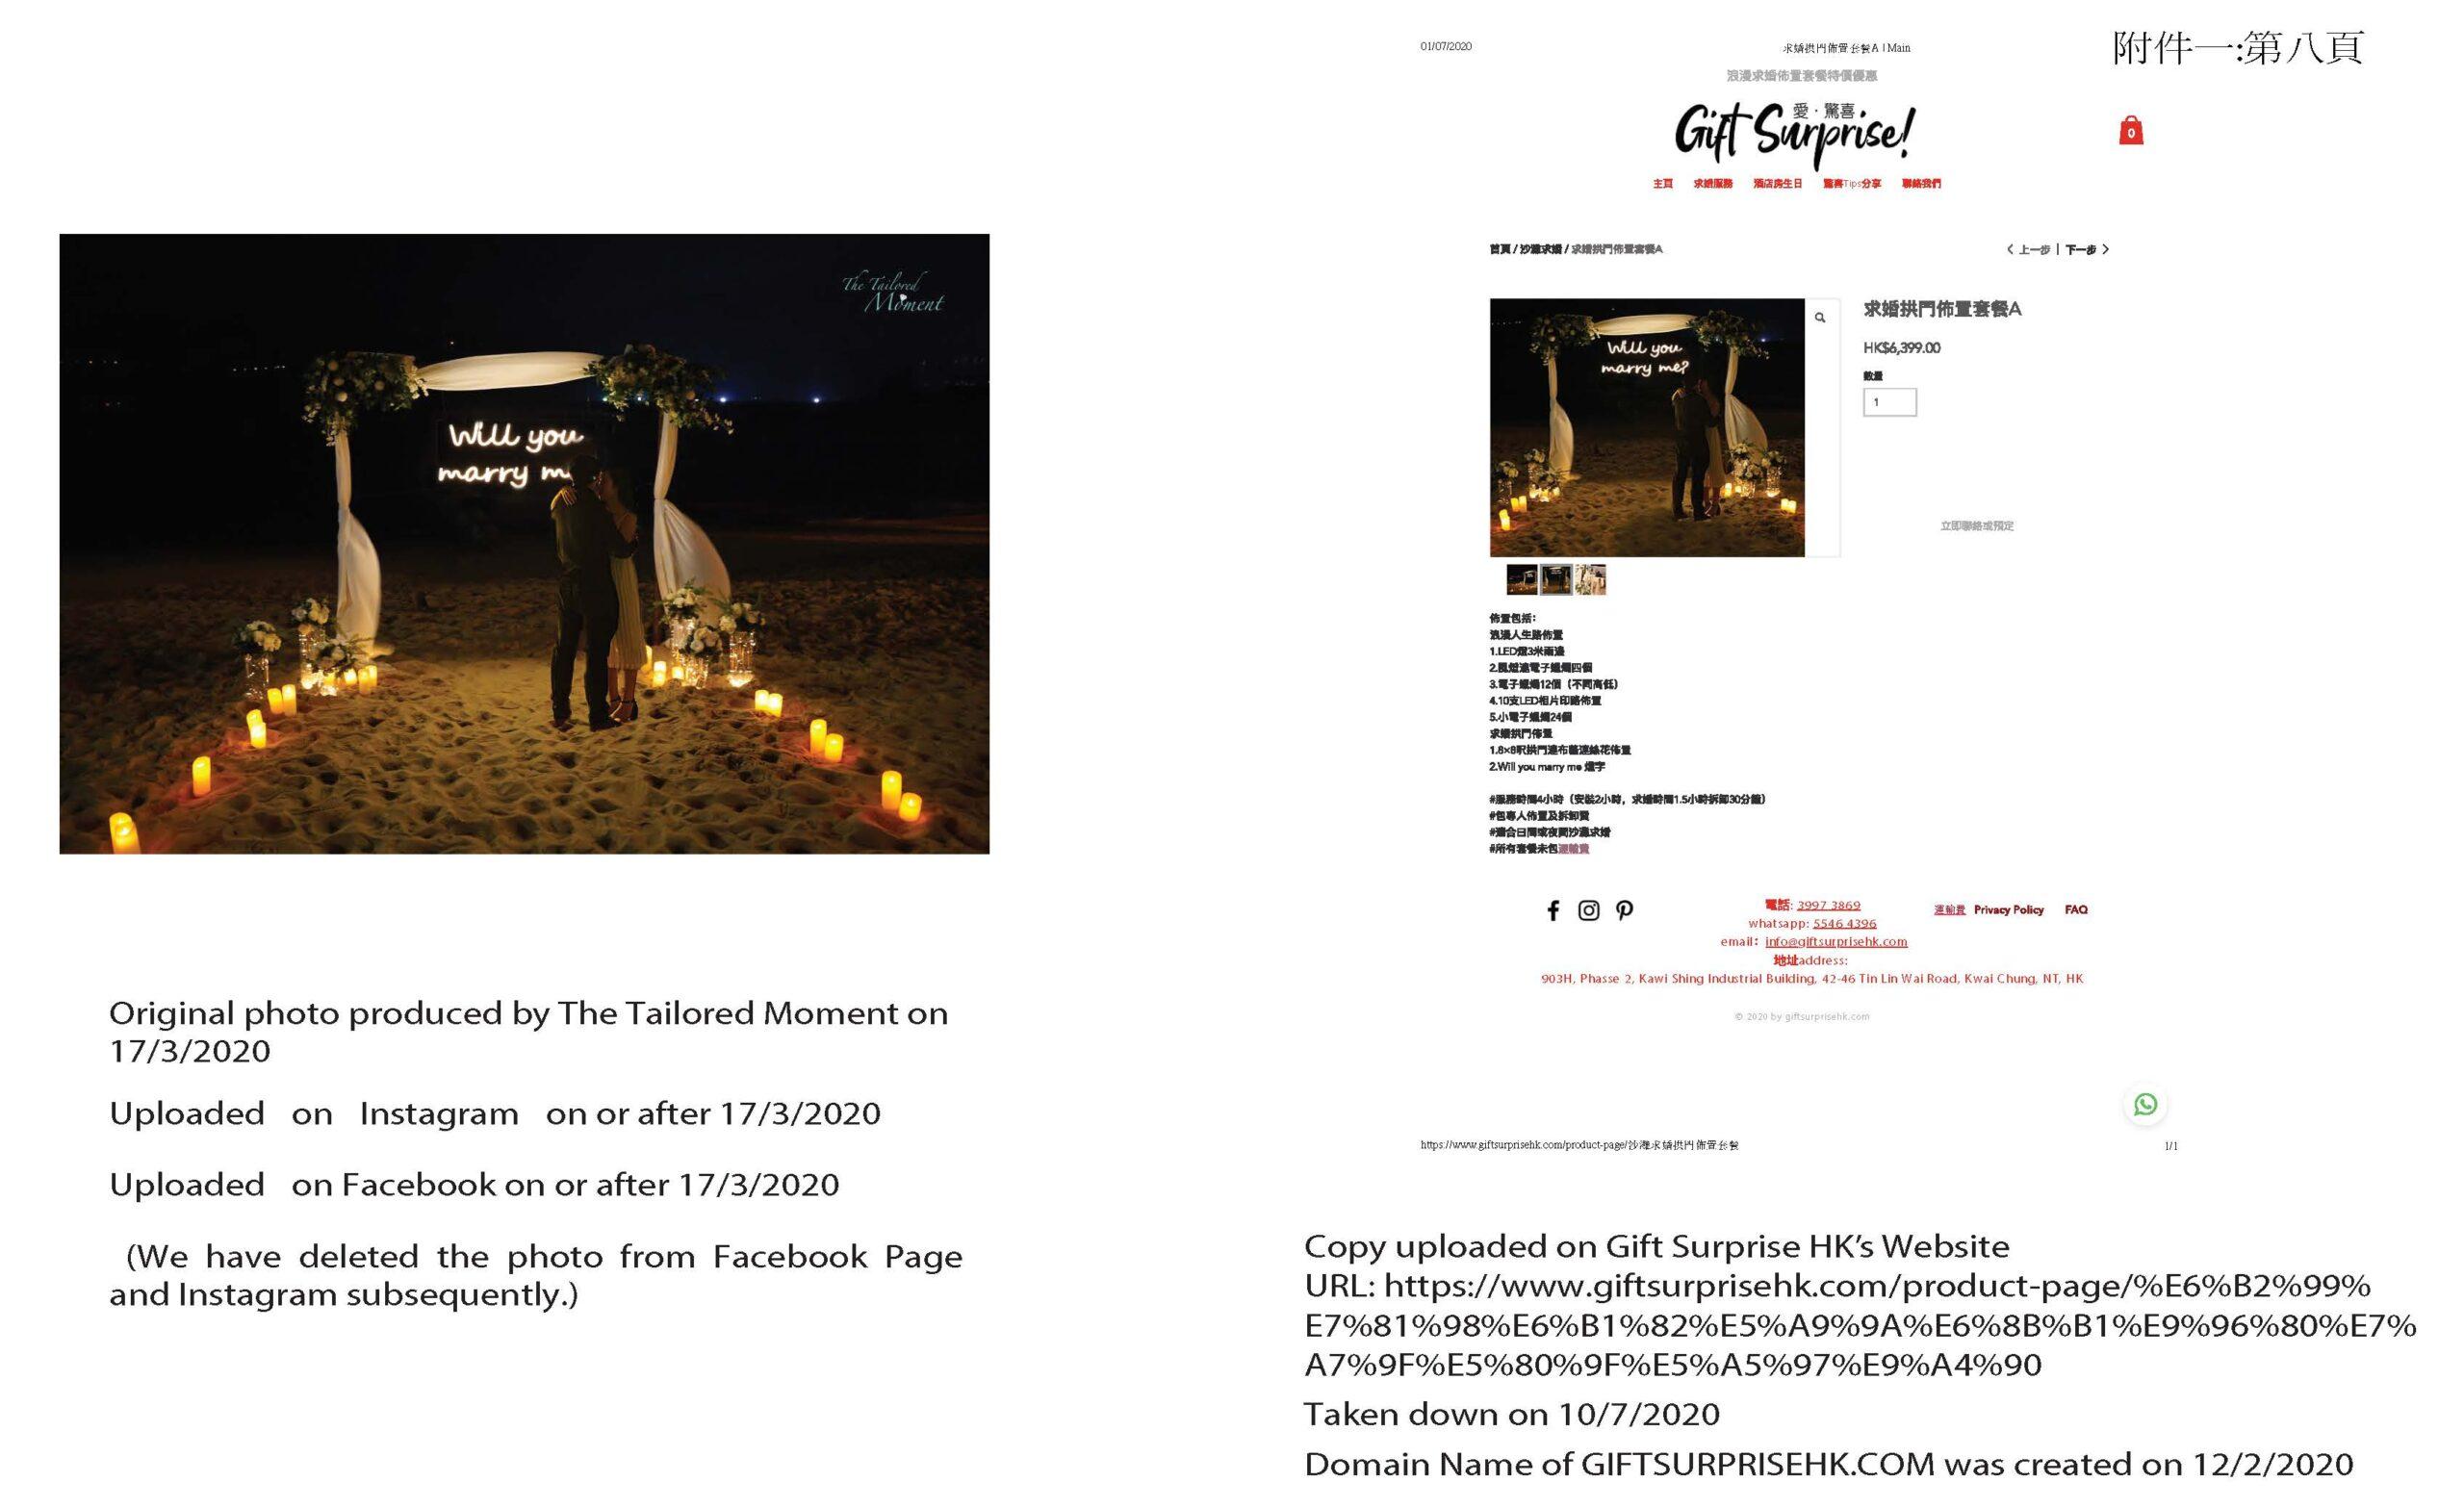 Gift Surprise在未經授權下複製及上載了「The Tailored Moment」 的照片事宜公告